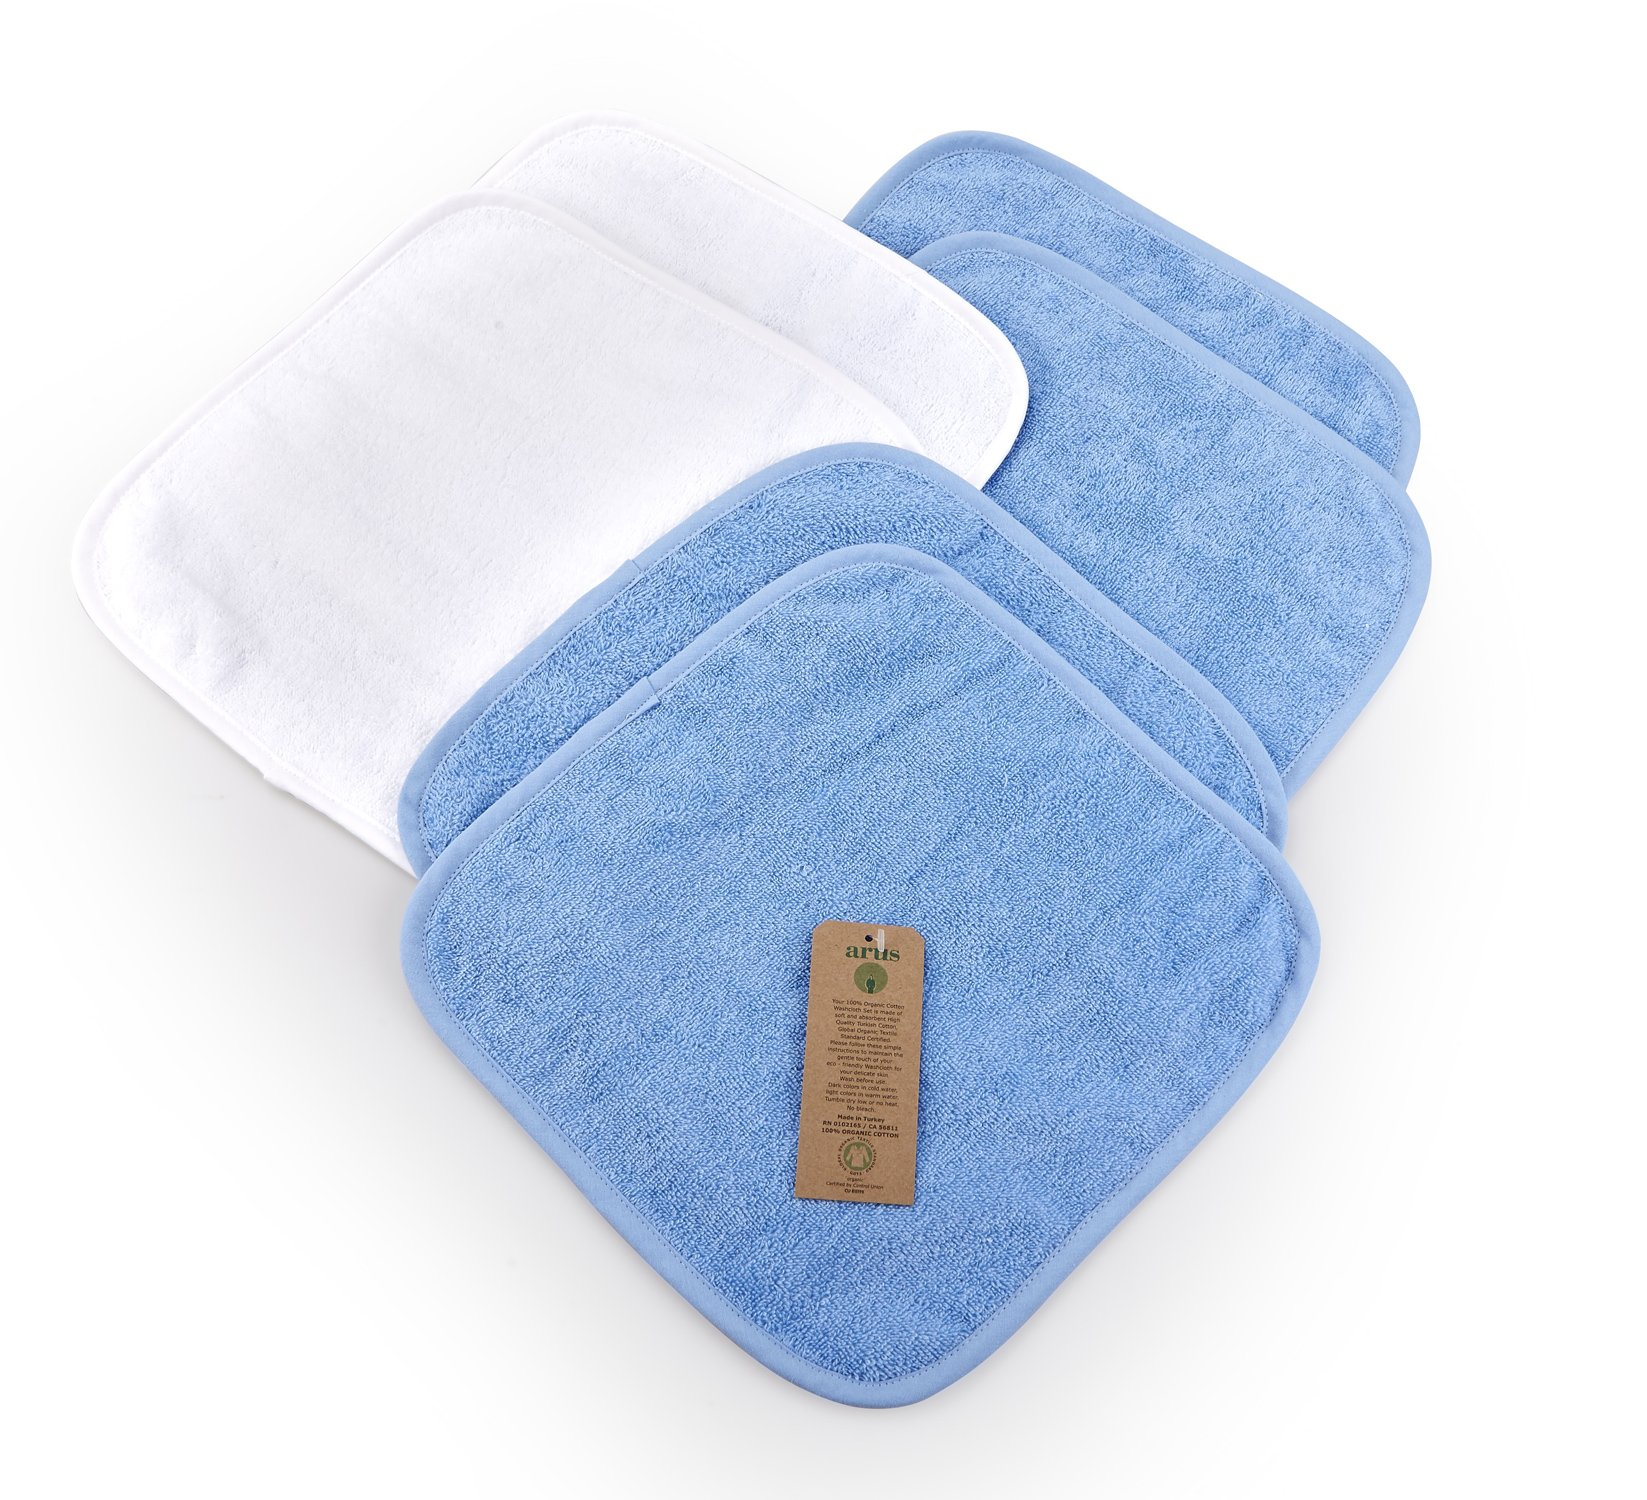 "Arus Baby Organic Turkish Cotton Soft Sensitive Natural Washcloths, 6 Pack (4 Blue, 2 White), 12""x12"""